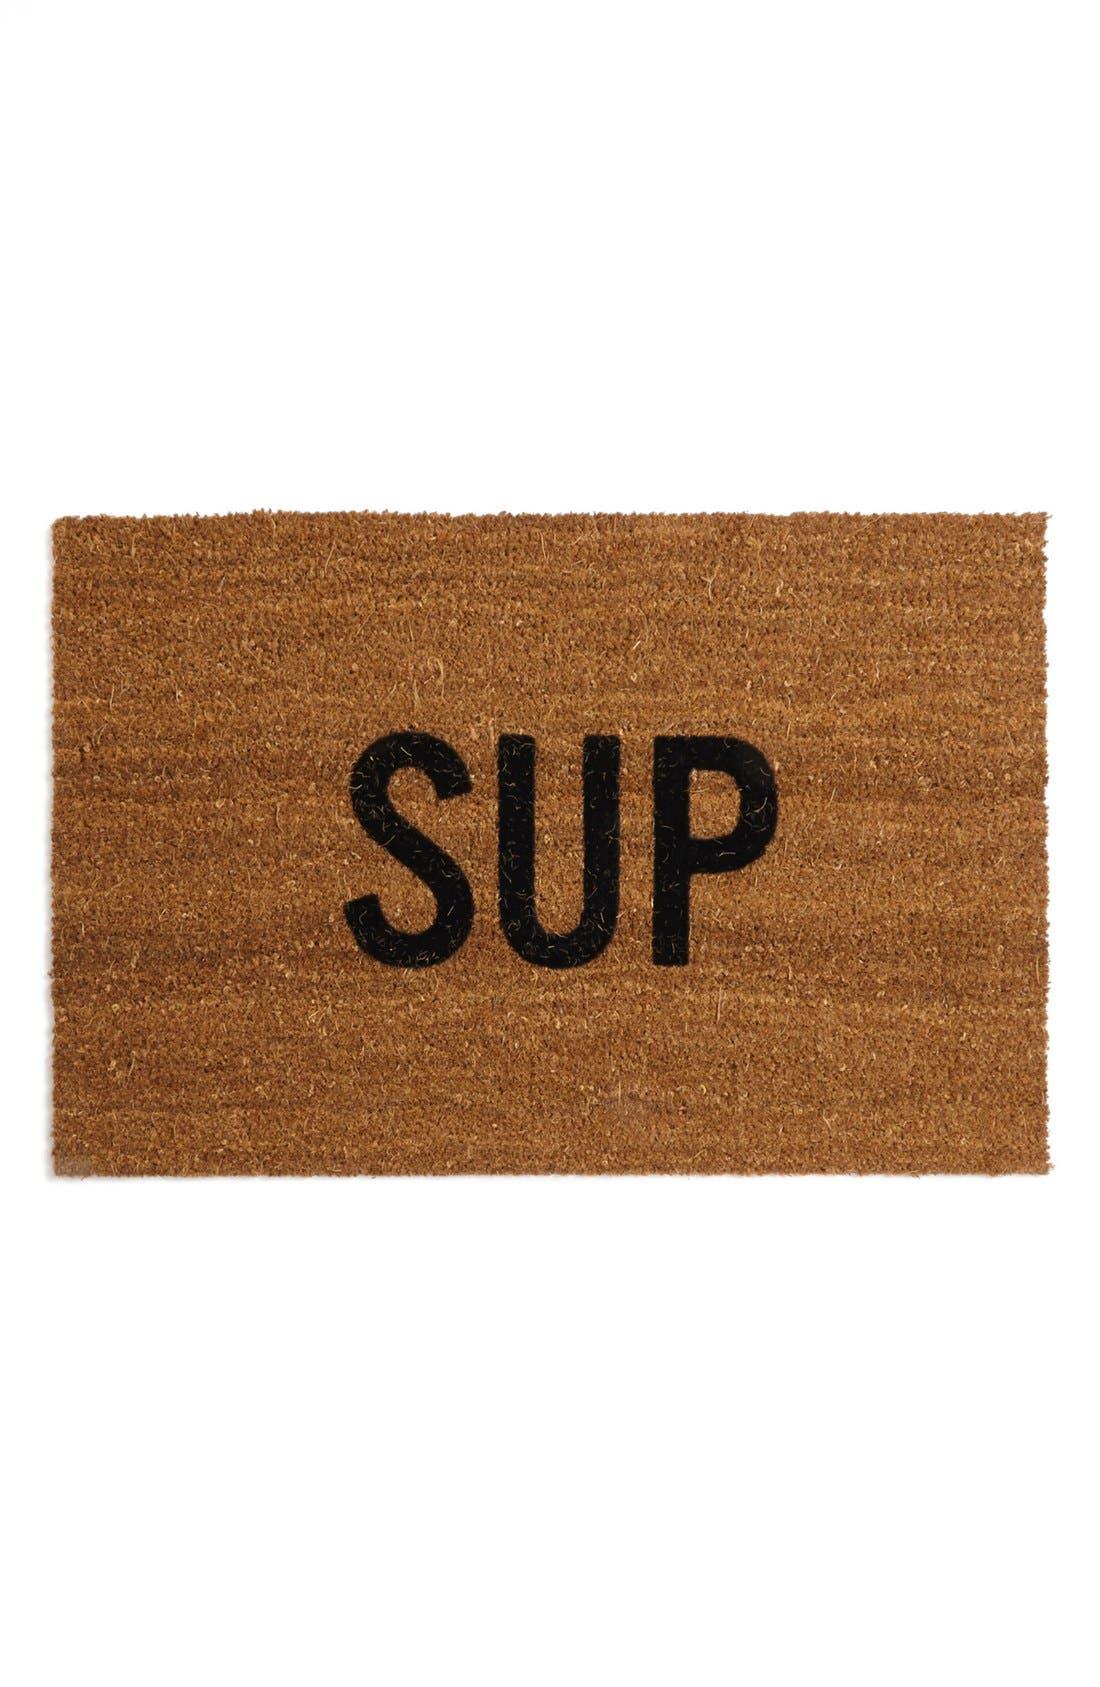 Alternate Image 1 Selected - Reed Wilson Design 'Sup' Doormat